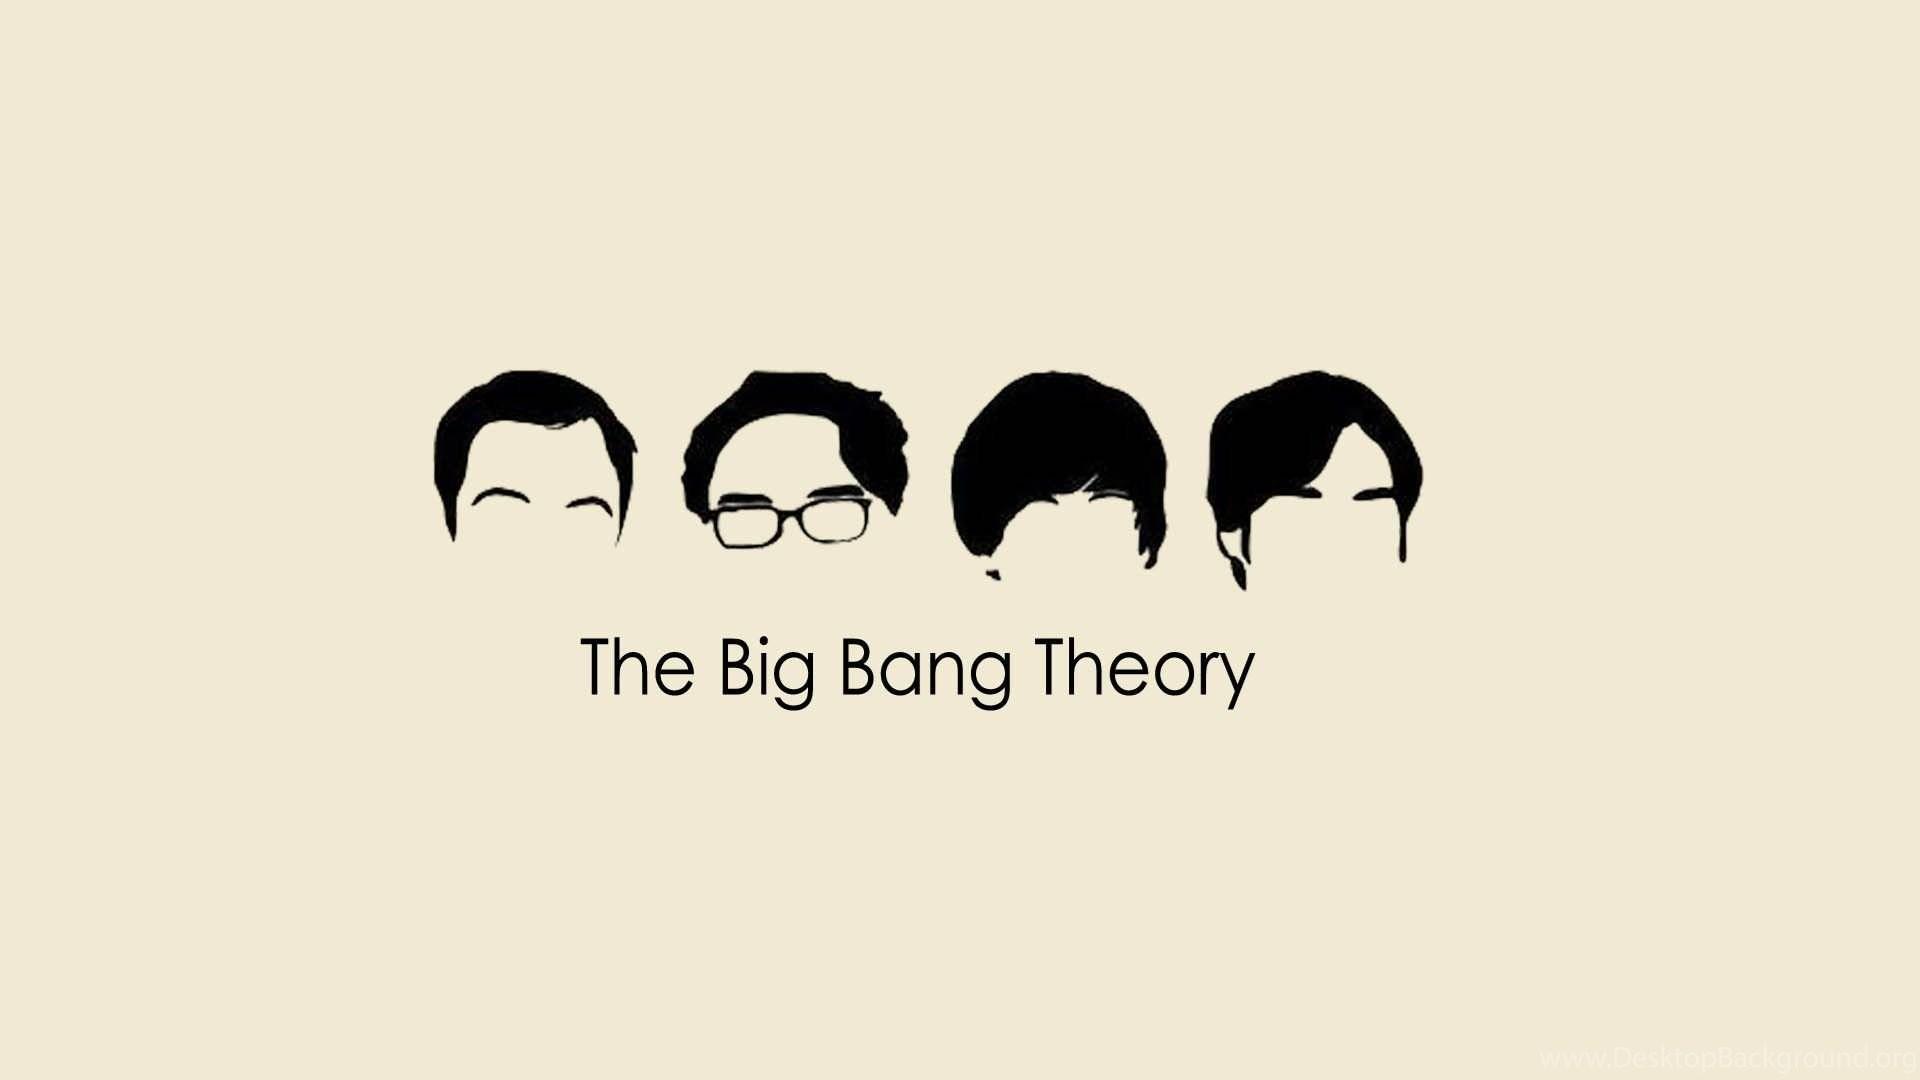 The Big Bang Theory Minimalist Hd Wallpaper Jpg Desktop Background